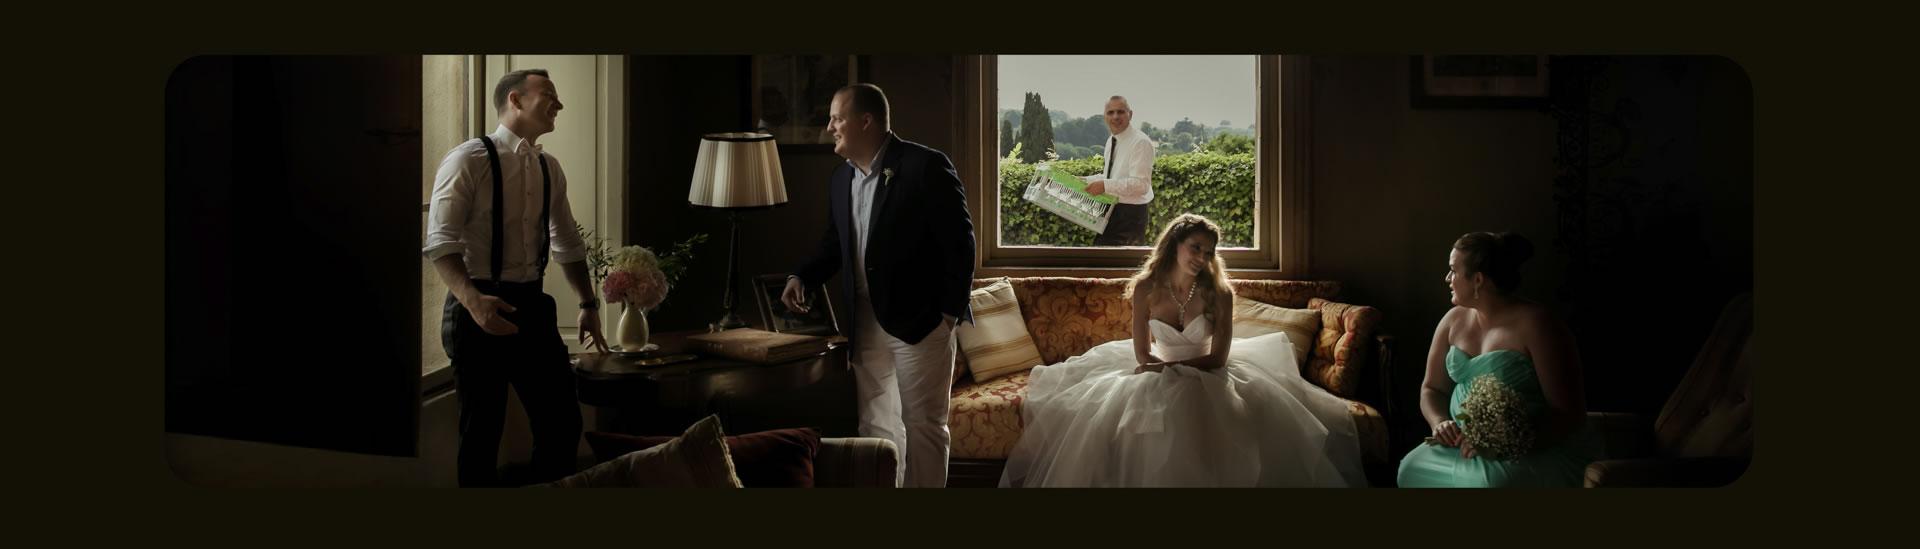 borgo-stomennano-david-bastianoni-photographer-00030 - 30 :: Wedding at Borgo Stomennano // WPPI 2018 // Our love is here to stay :: Luxury wedding photography - 29 :: borgo-stomennano-david-bastianoni-photographer-00030 - 30